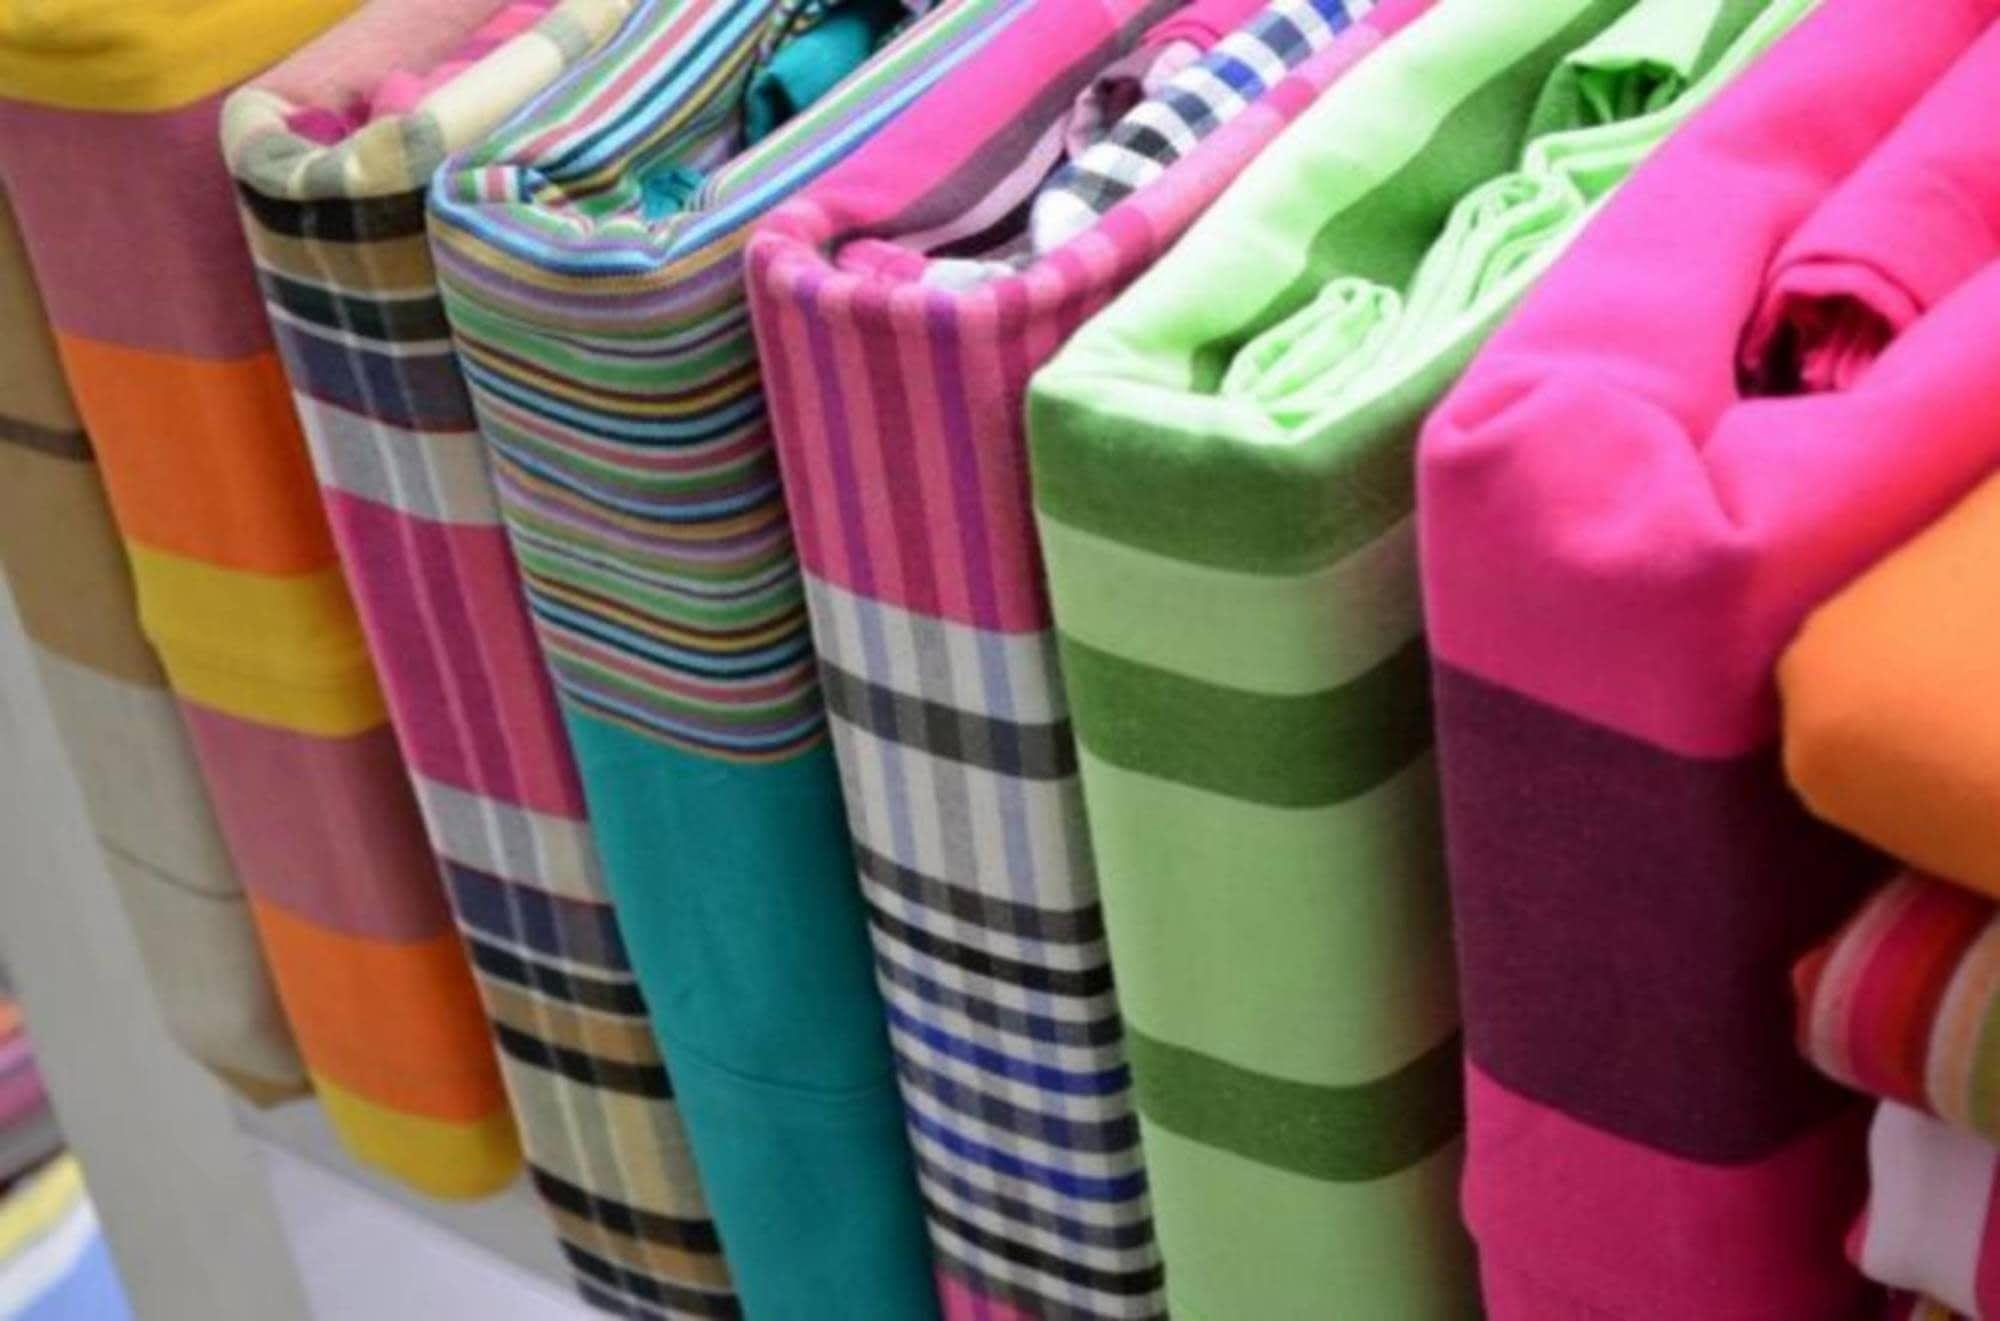 Tintes de ropa: Servicios que ofrecemos de Tintorería Almeda